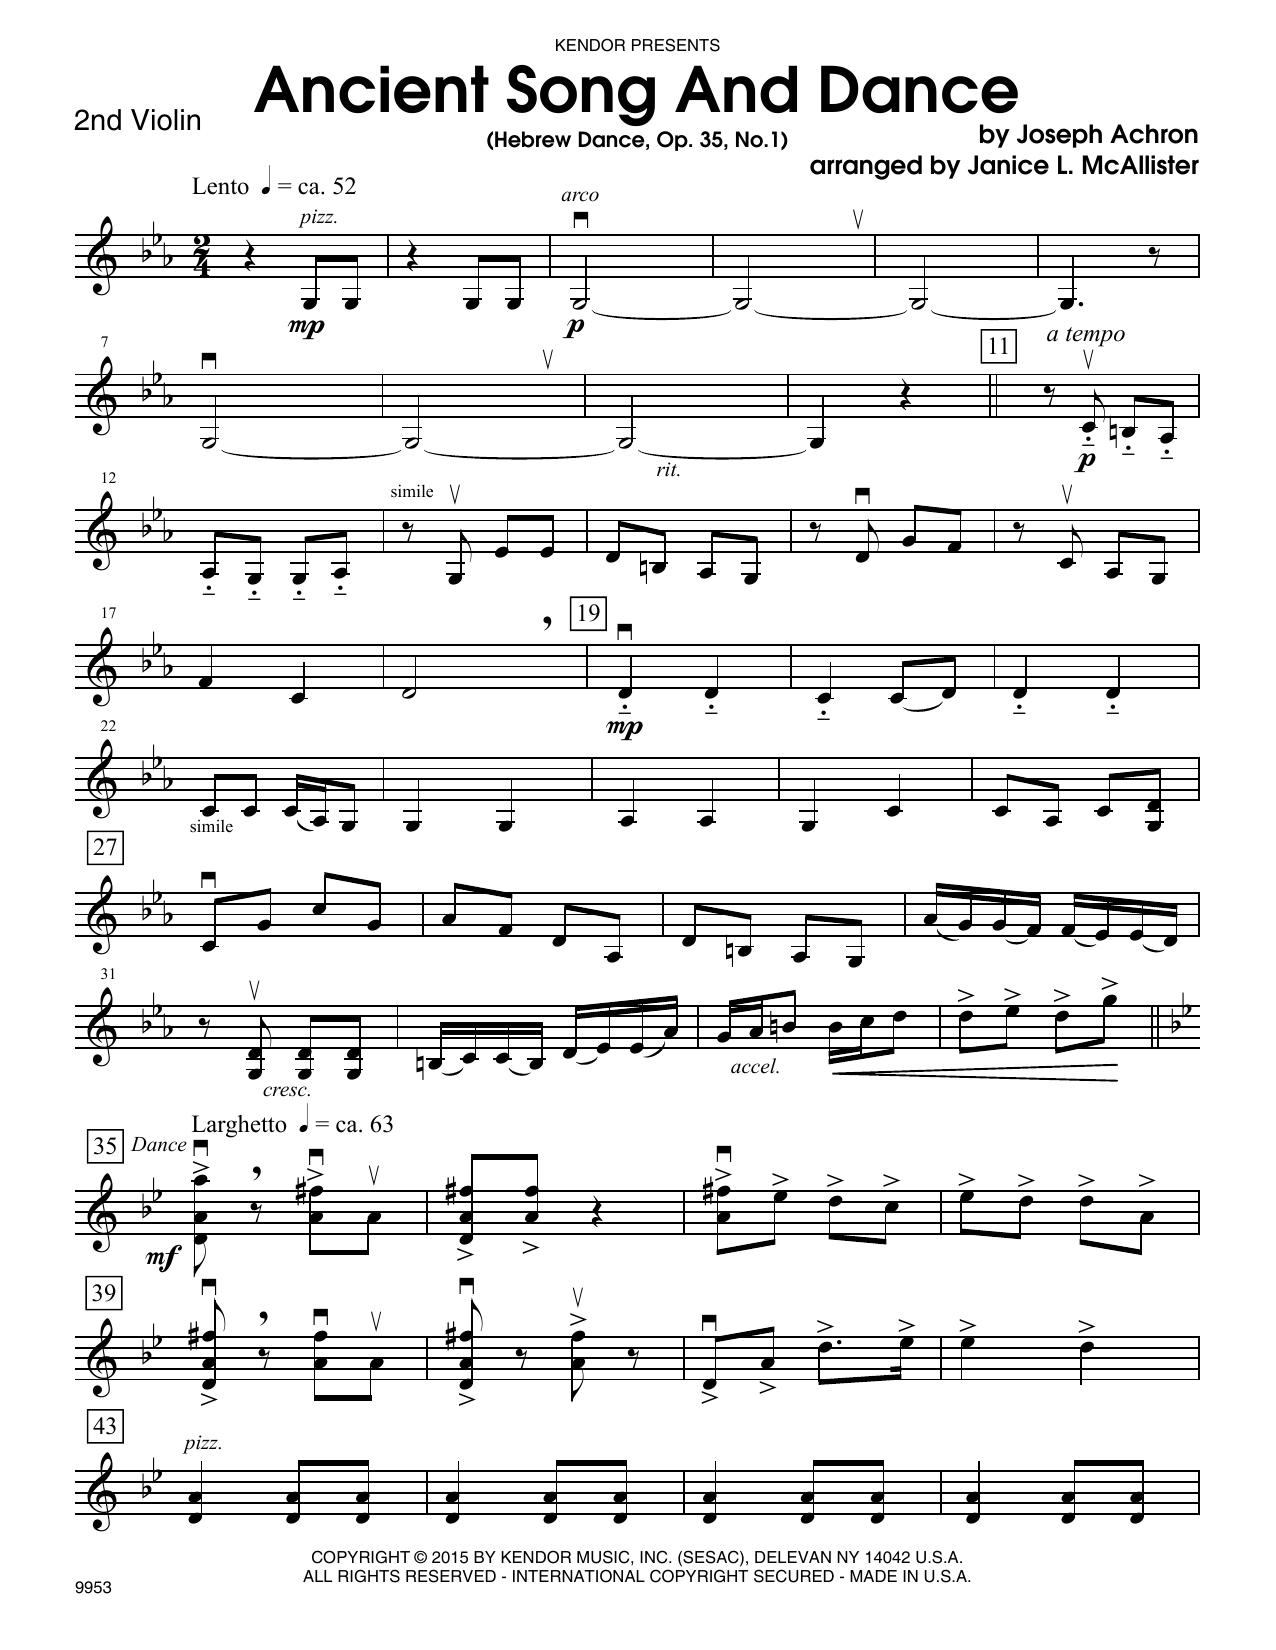 Ancient Song And Dance (Hebrew Dance, Op. 35, No. 1) - 2nd Violin